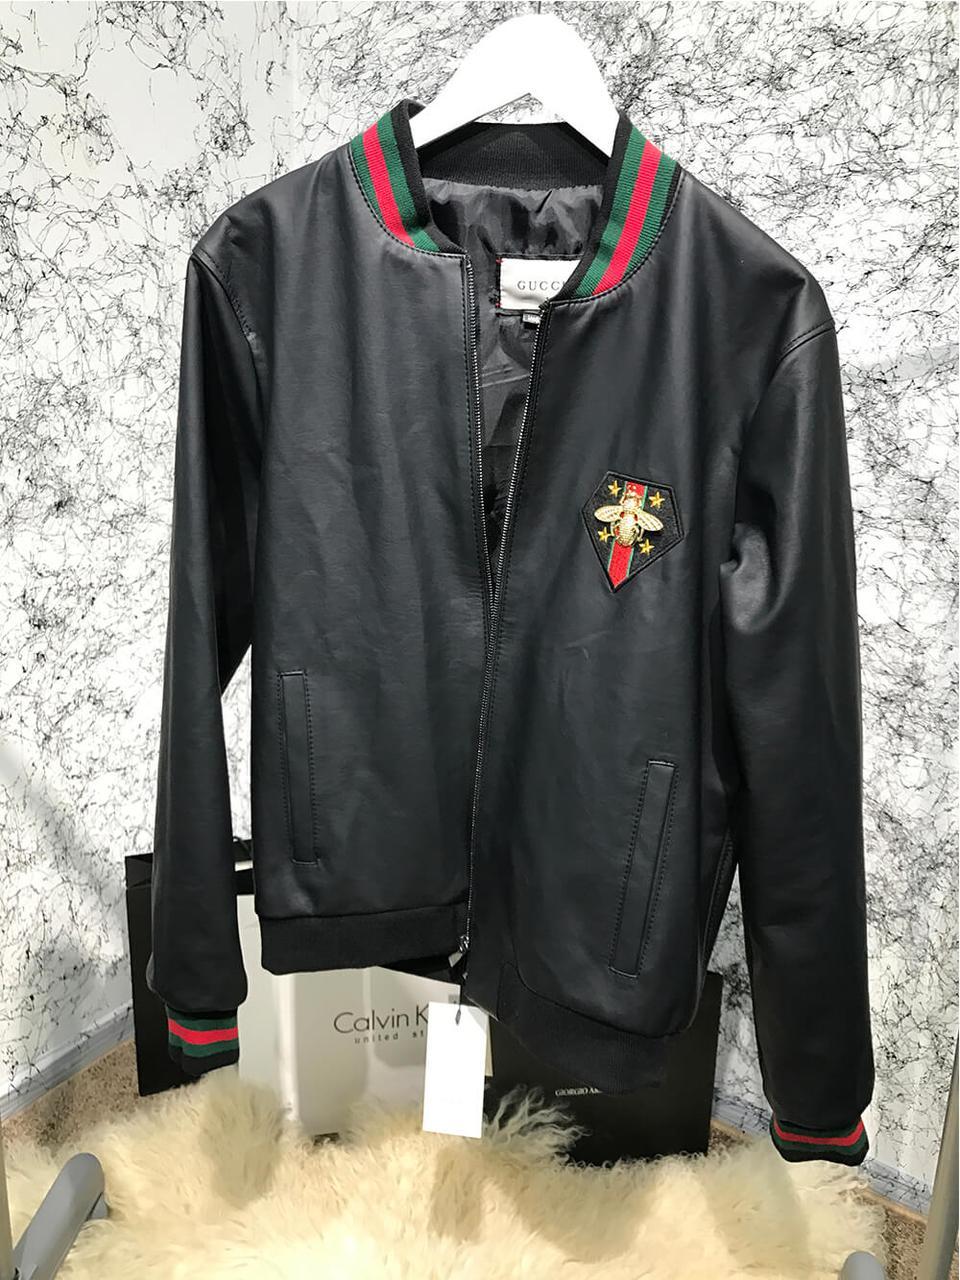 ba95c201121f Куртка Gucci Bee with Web Black реплика - Tali Fashion - стильная одежда и  аксессуары!